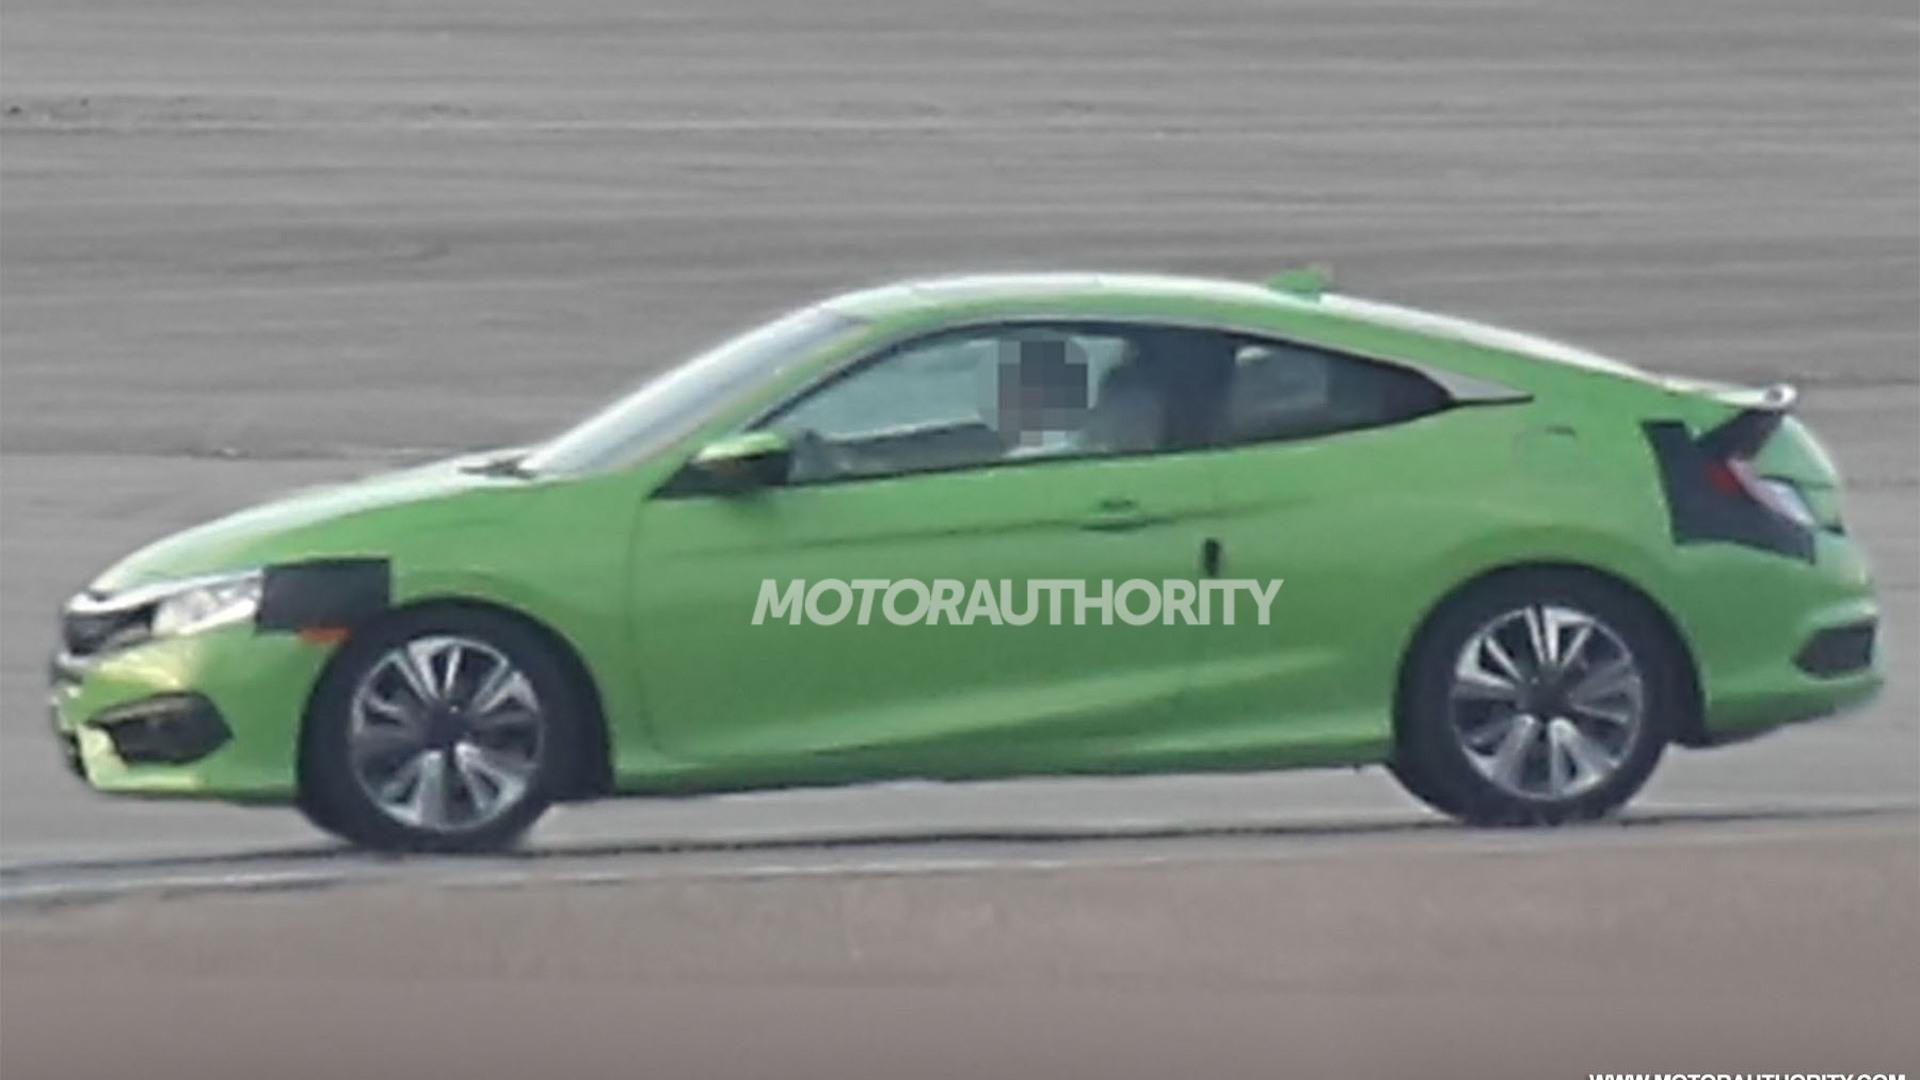 2016 Honda Civic Coupe spy shots - Image via S. Baldauf/SB-Medien